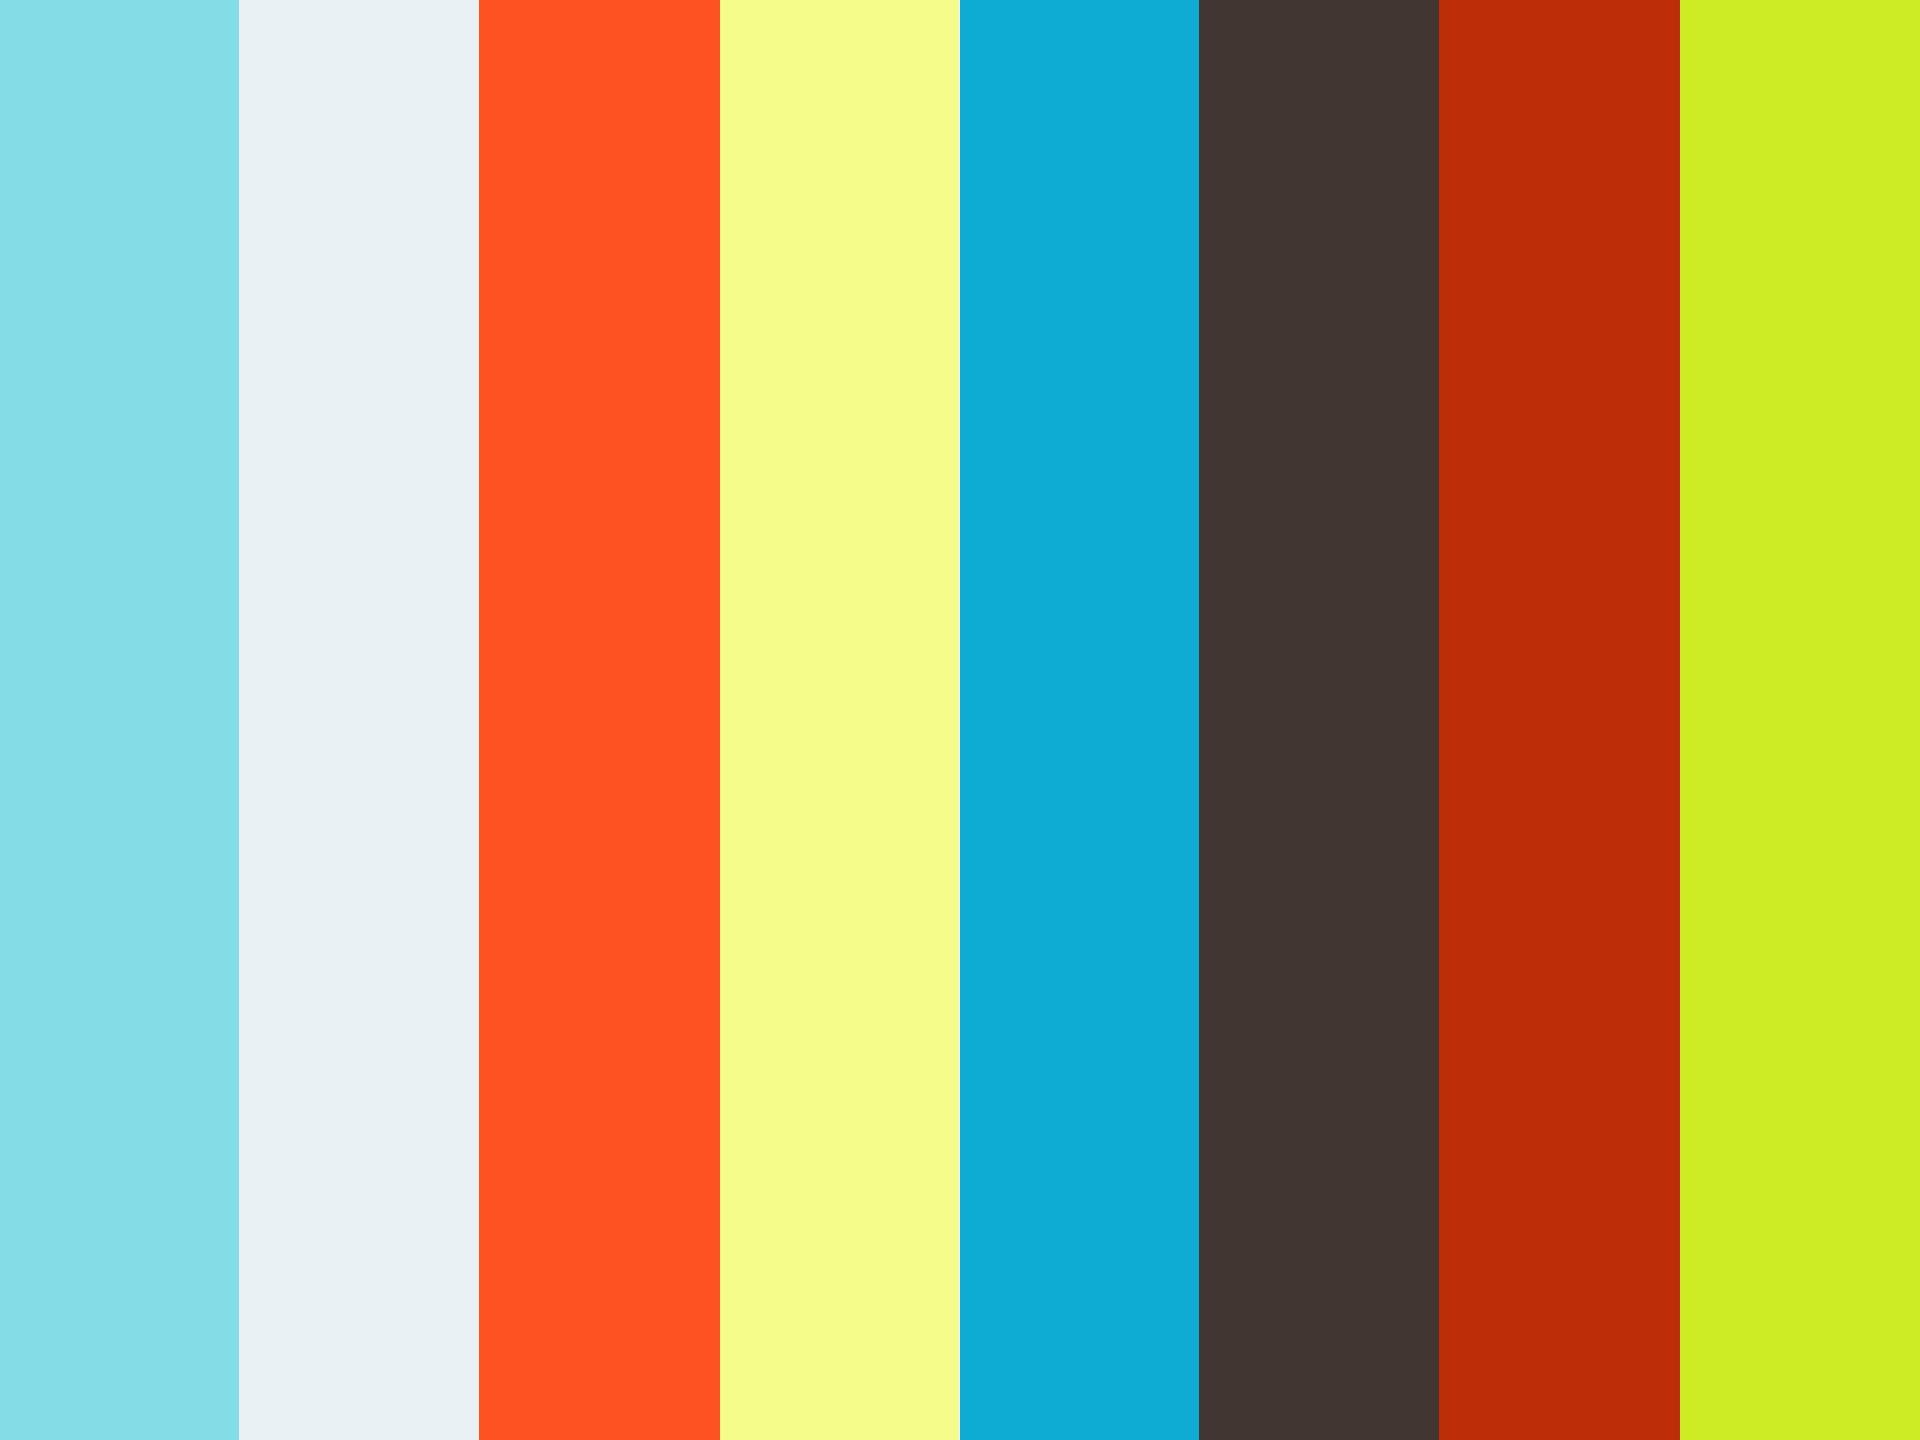 SAMPLE: Event Program Design on Vimeo